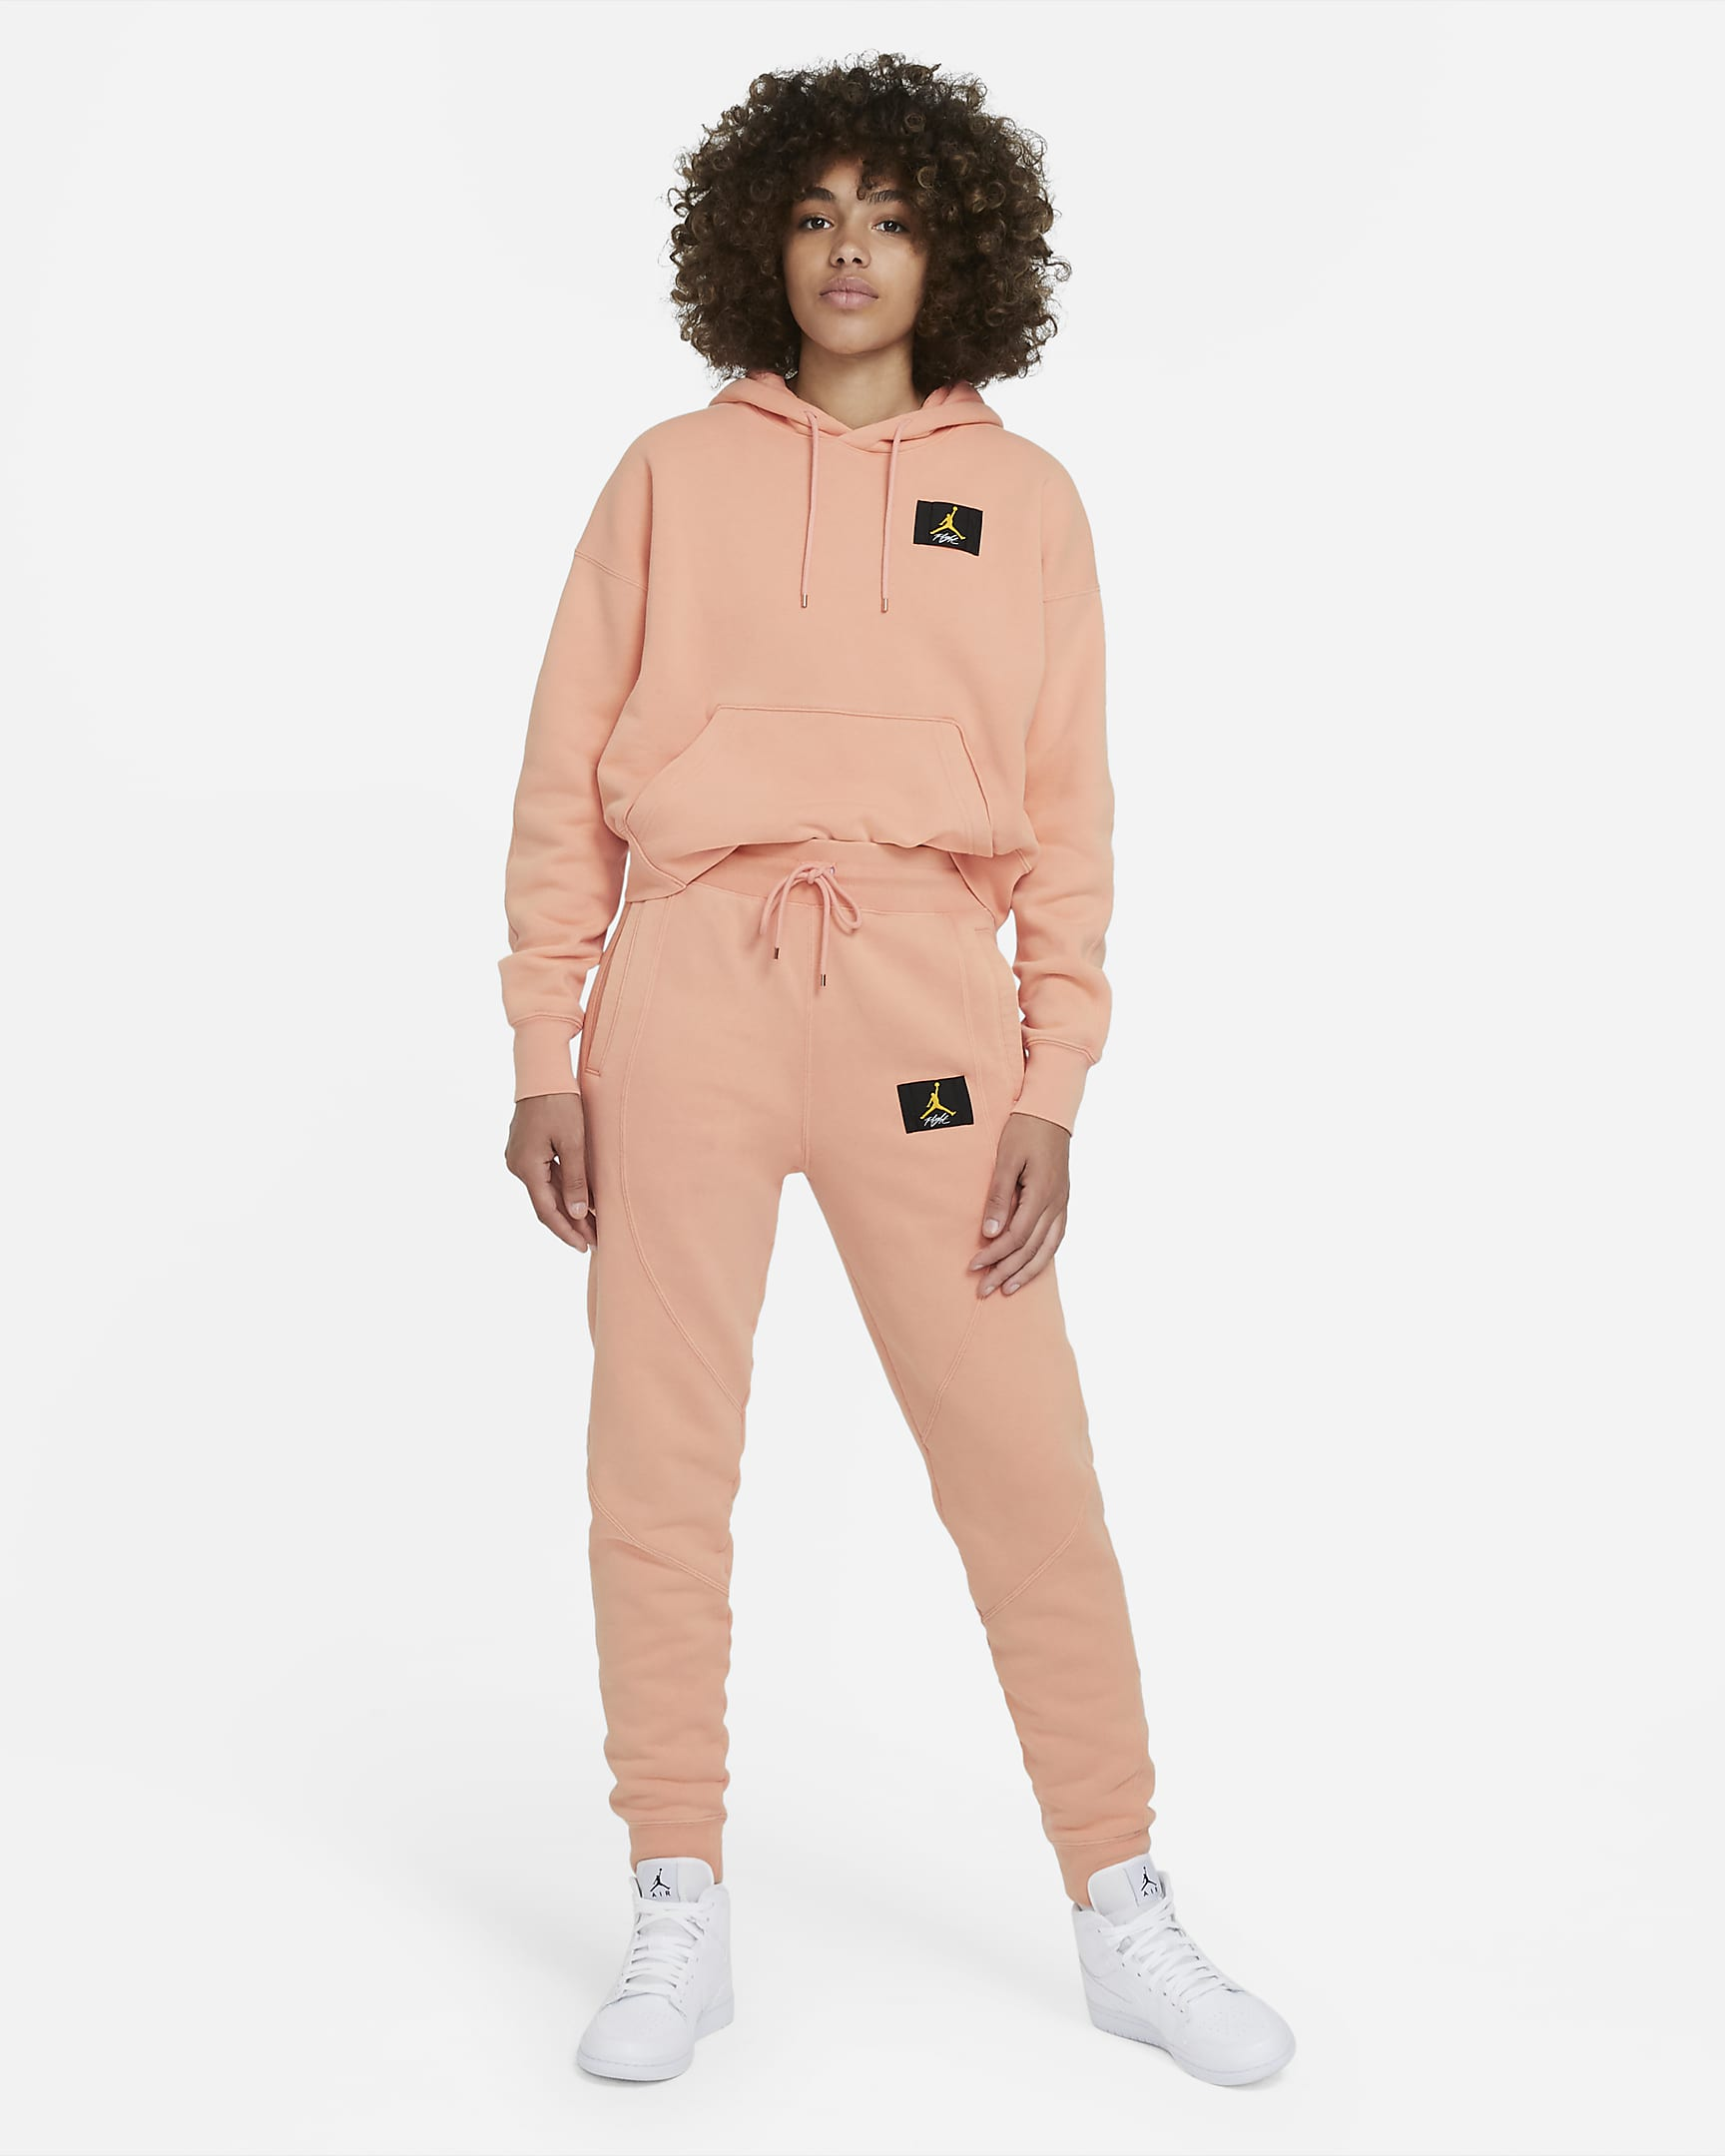 jordan-flight-womens-fleece-pants-0Bl3RW copy